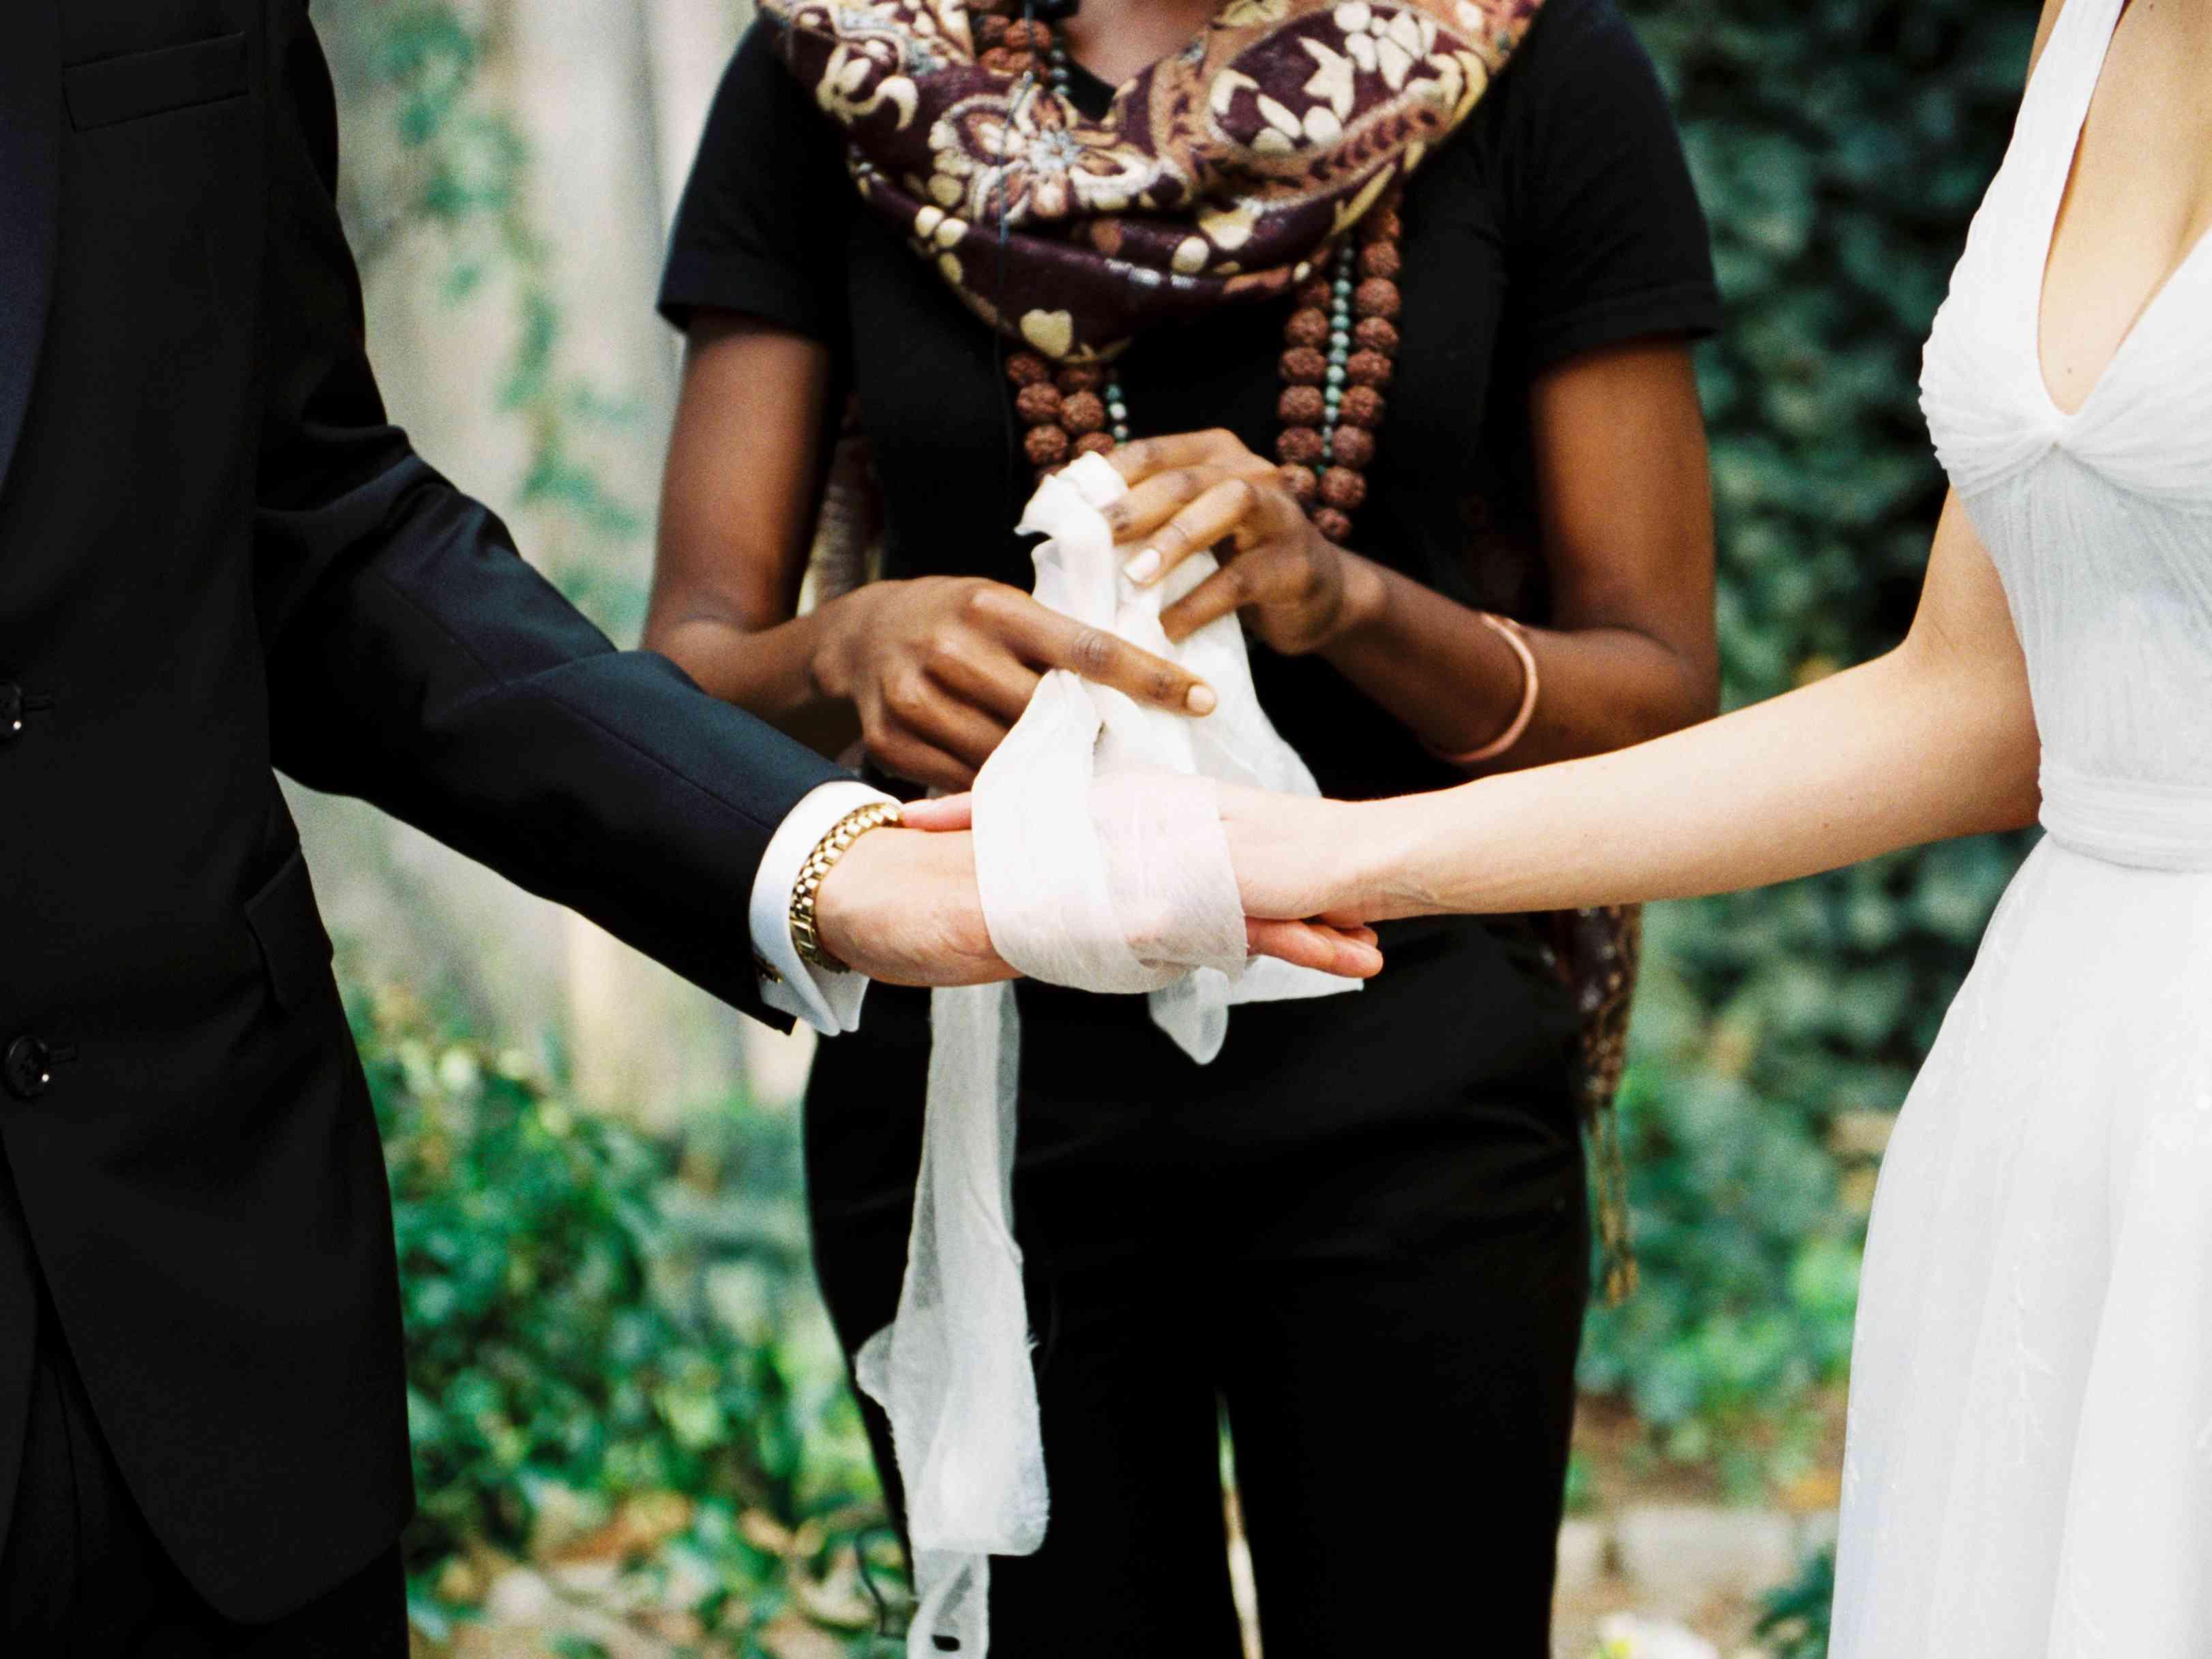 Nuptial ceremony